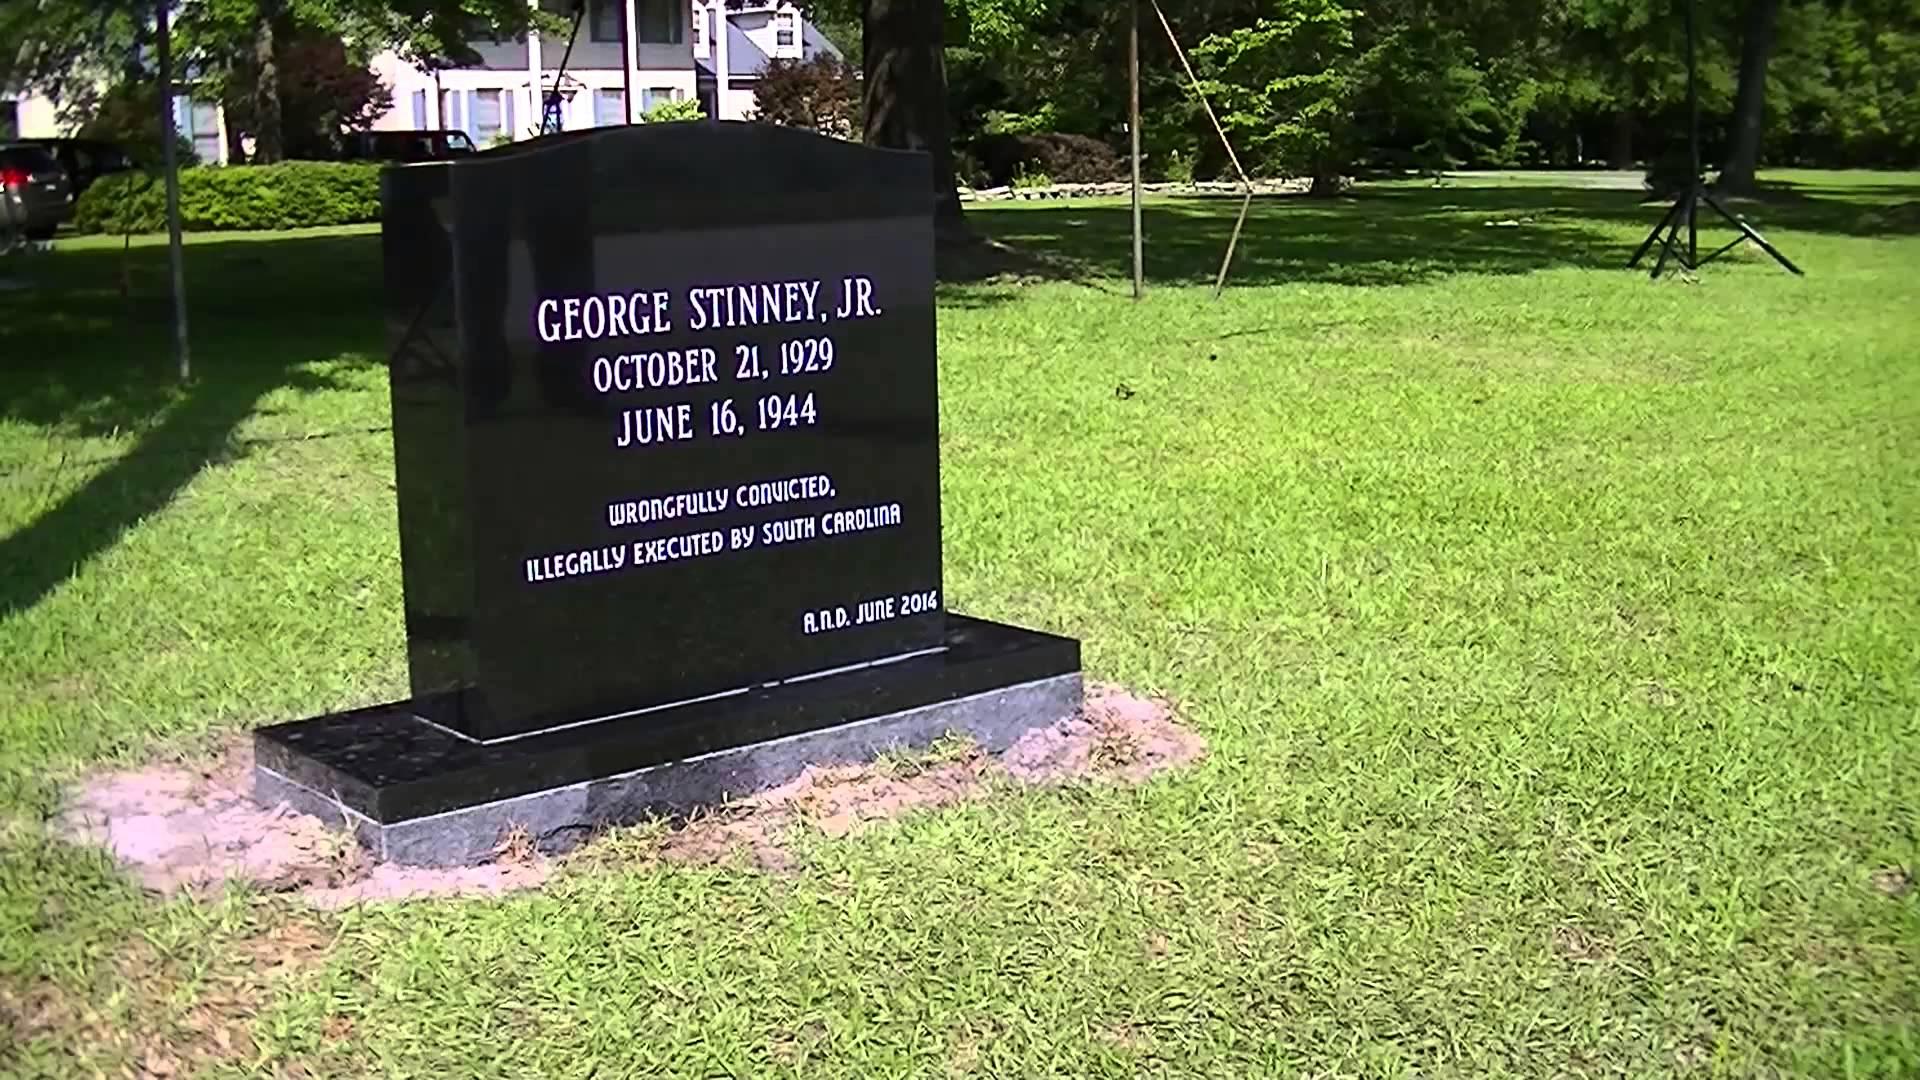 South Carolina Electrocutes George Stinney Jr